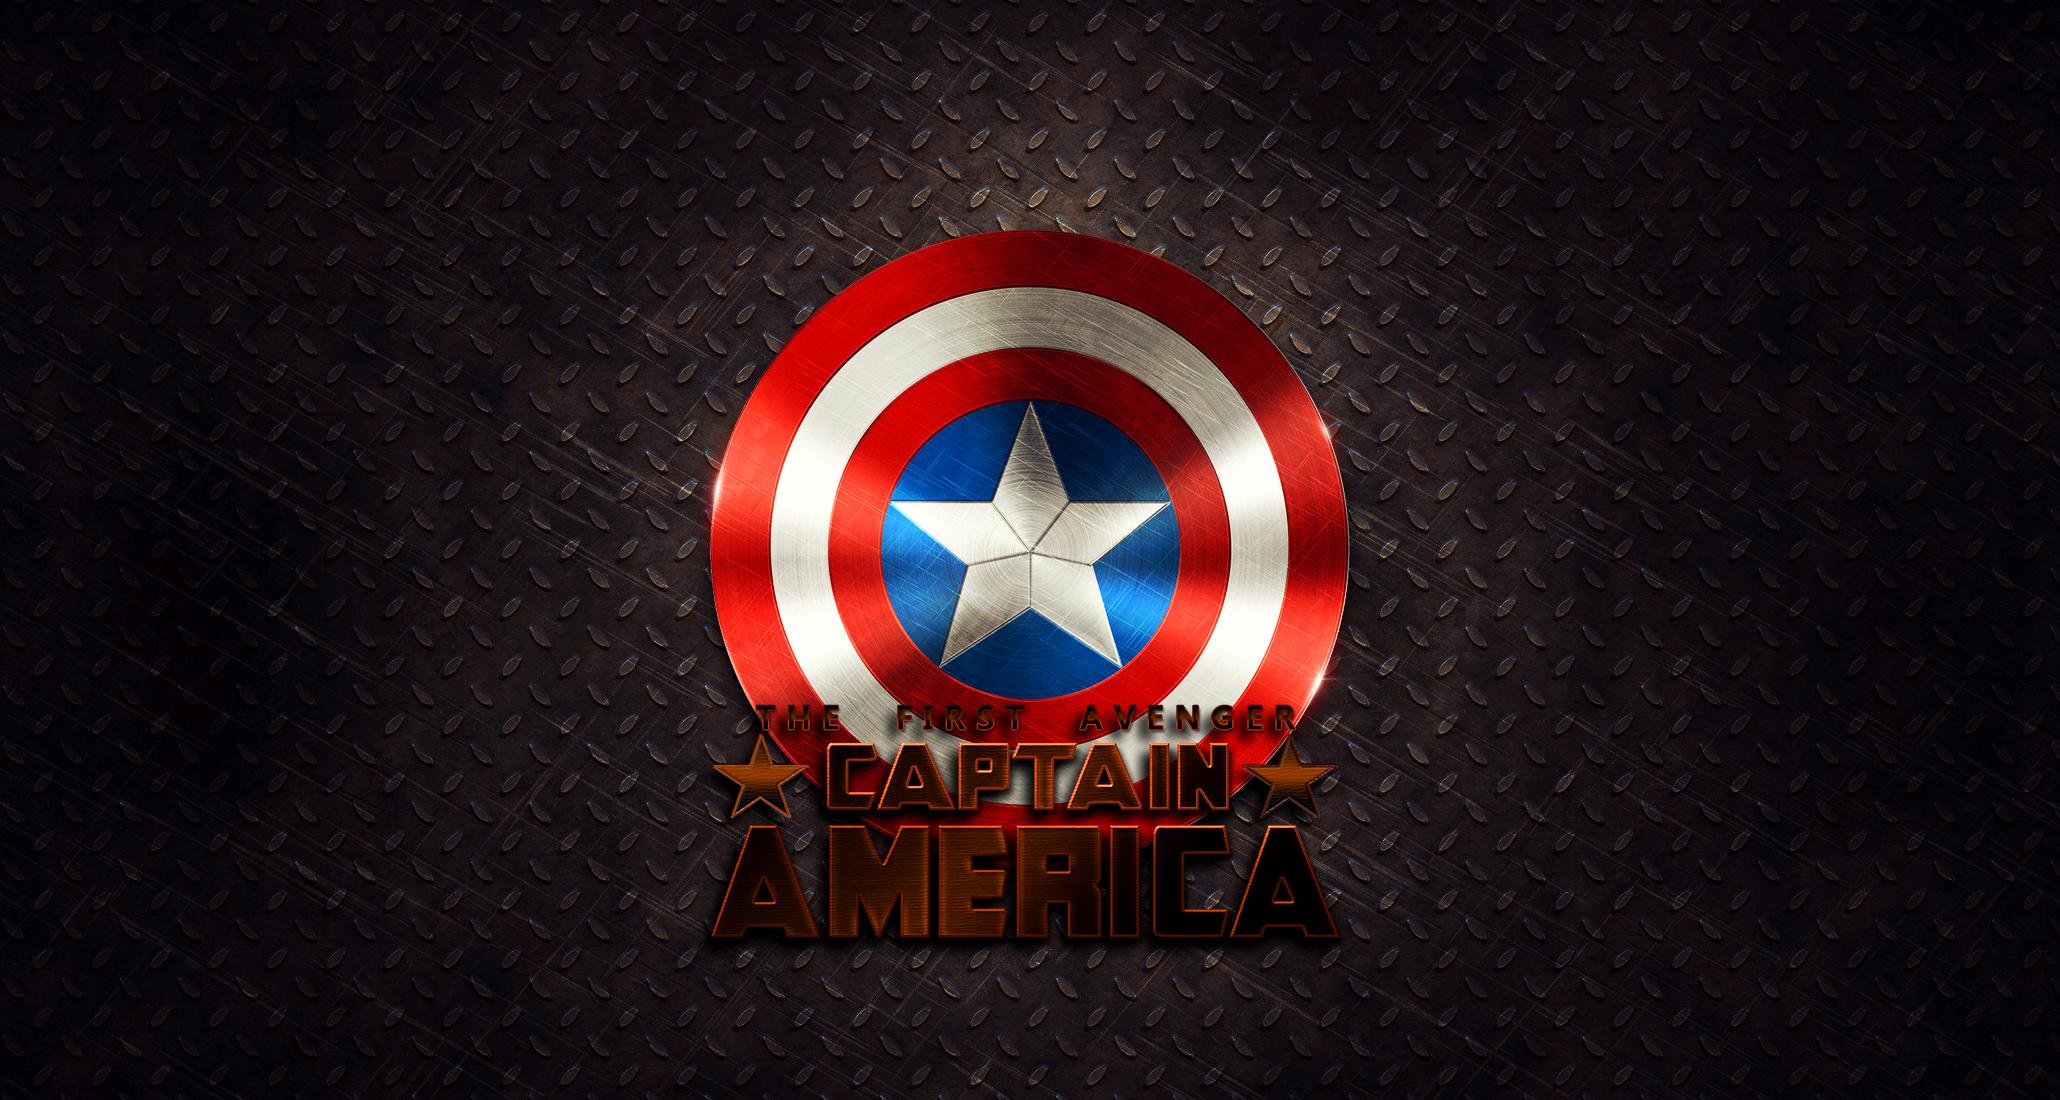 Imagenes Del America Para Fondo De Pantalla: «The Avengers»